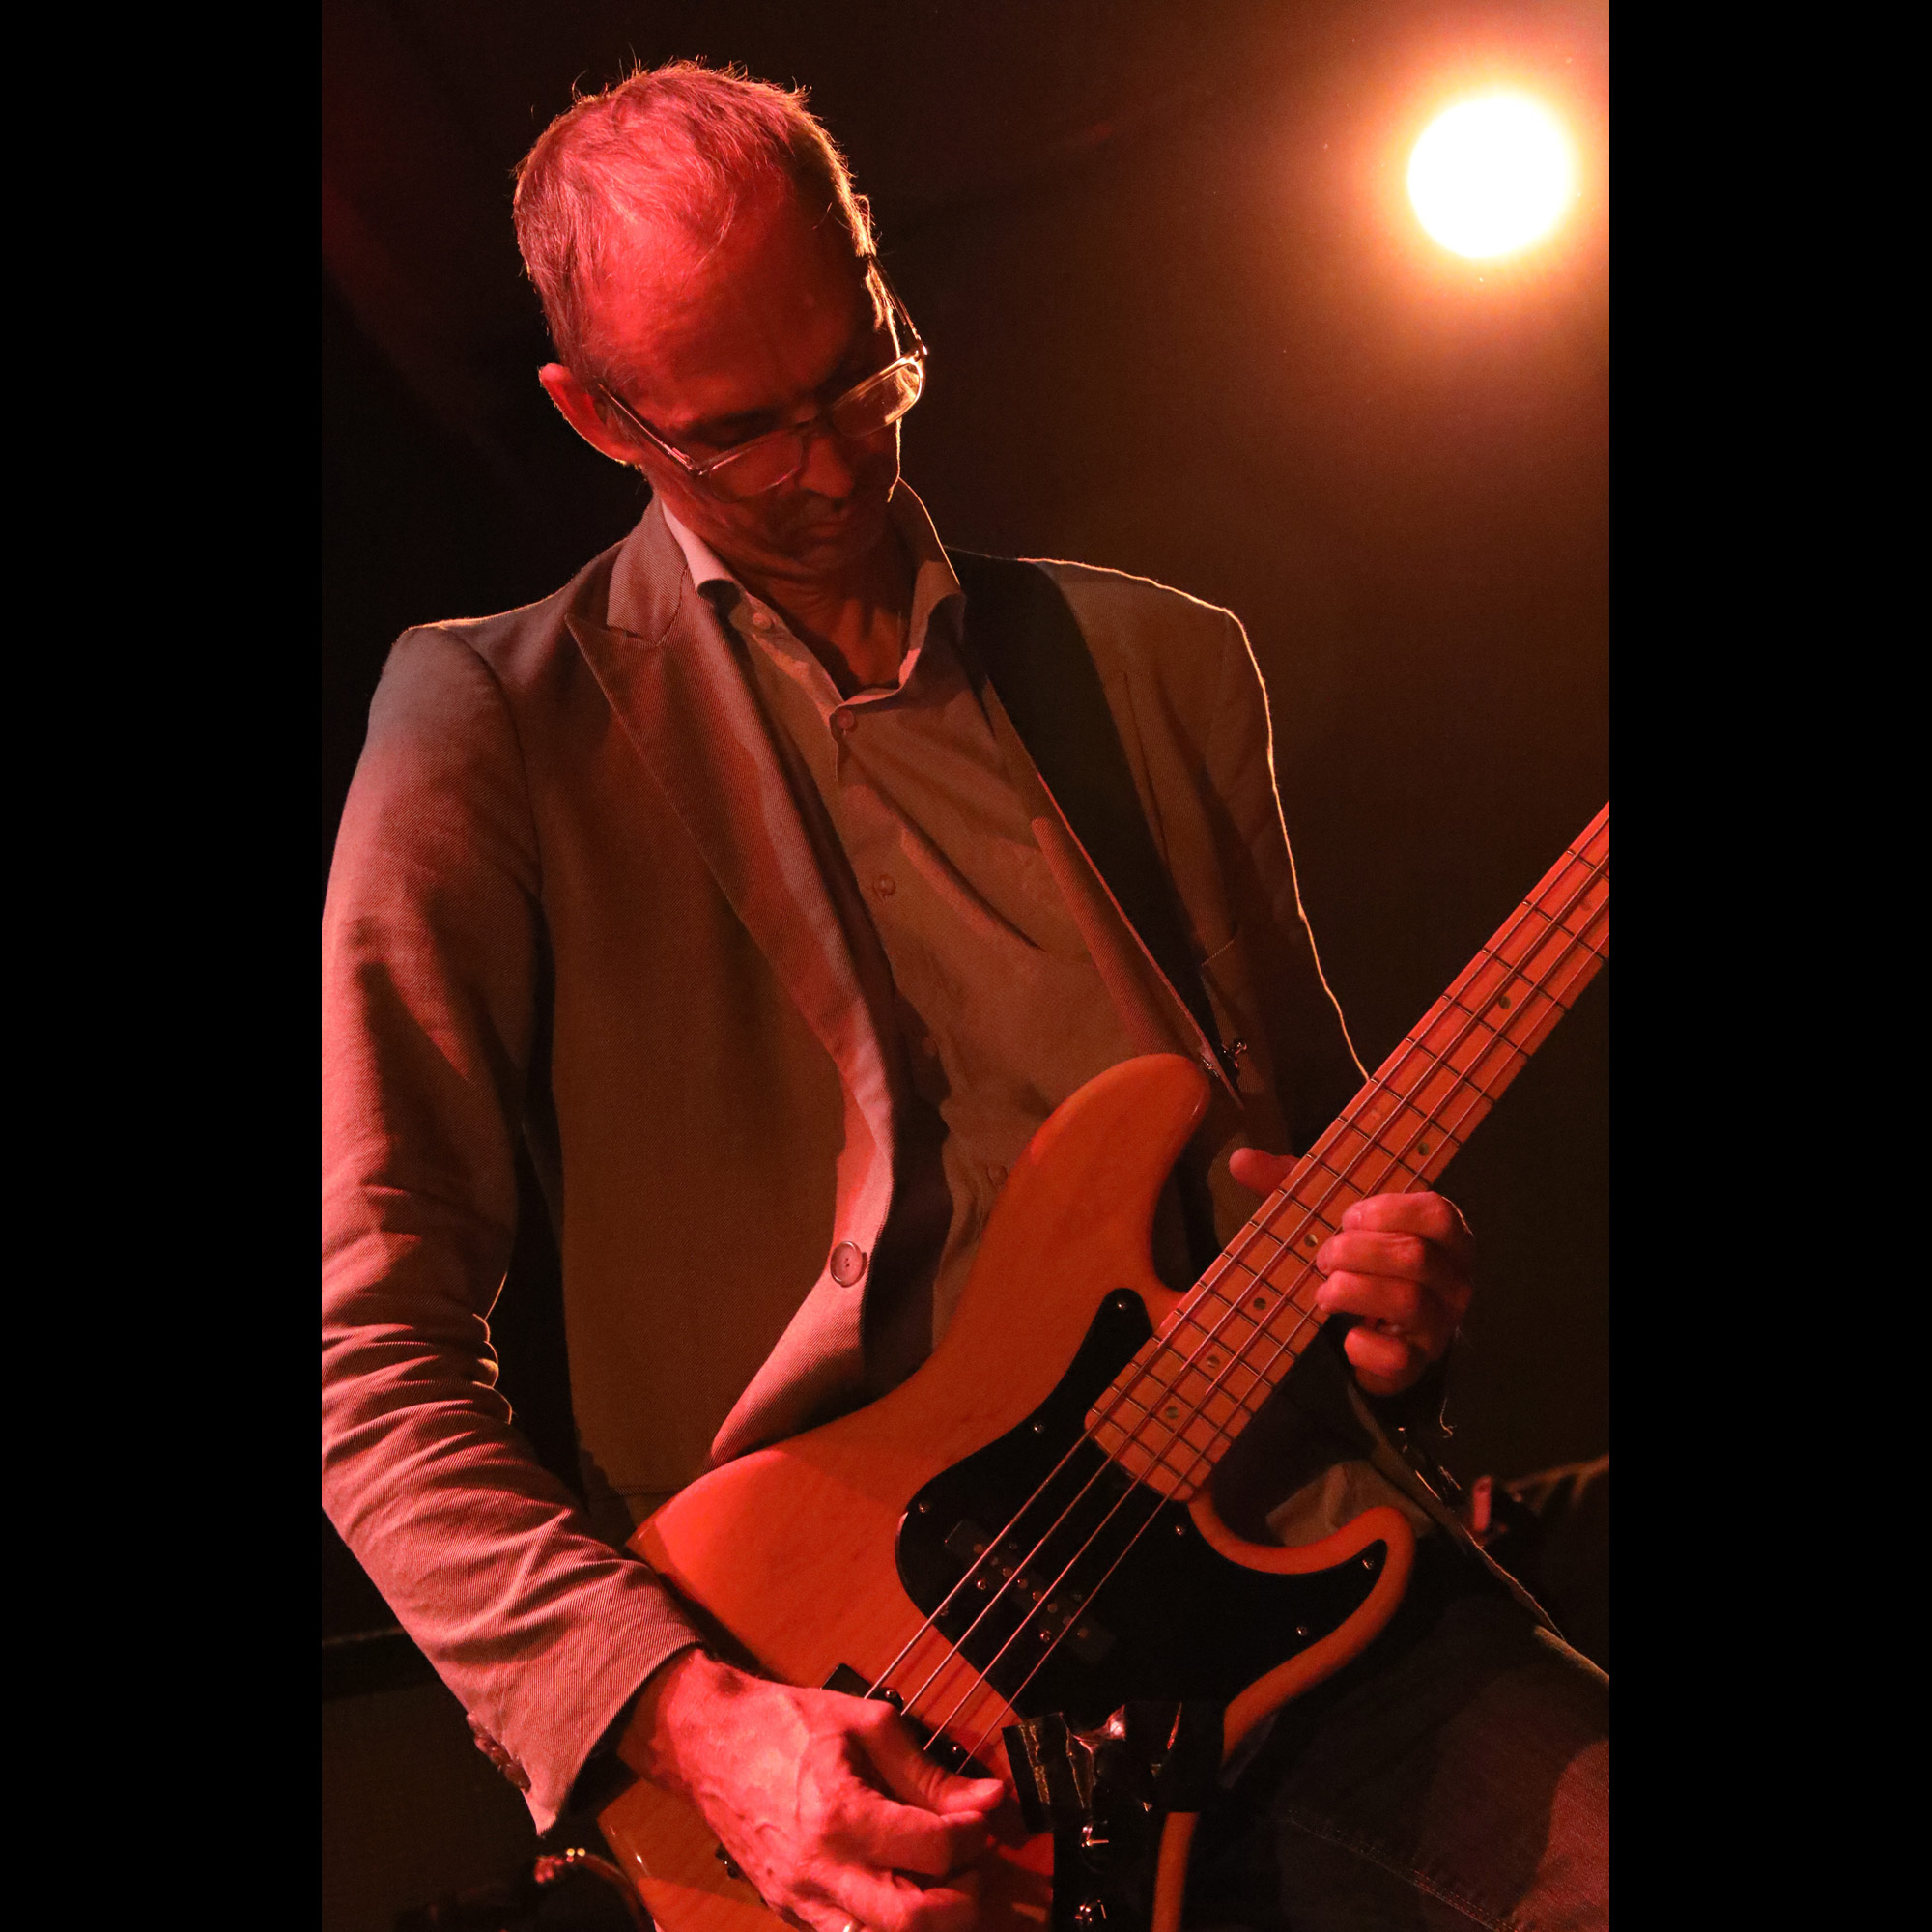 philipp-rasthofer-colour-haze-bass-(Photo-by-JJ-Koczan)